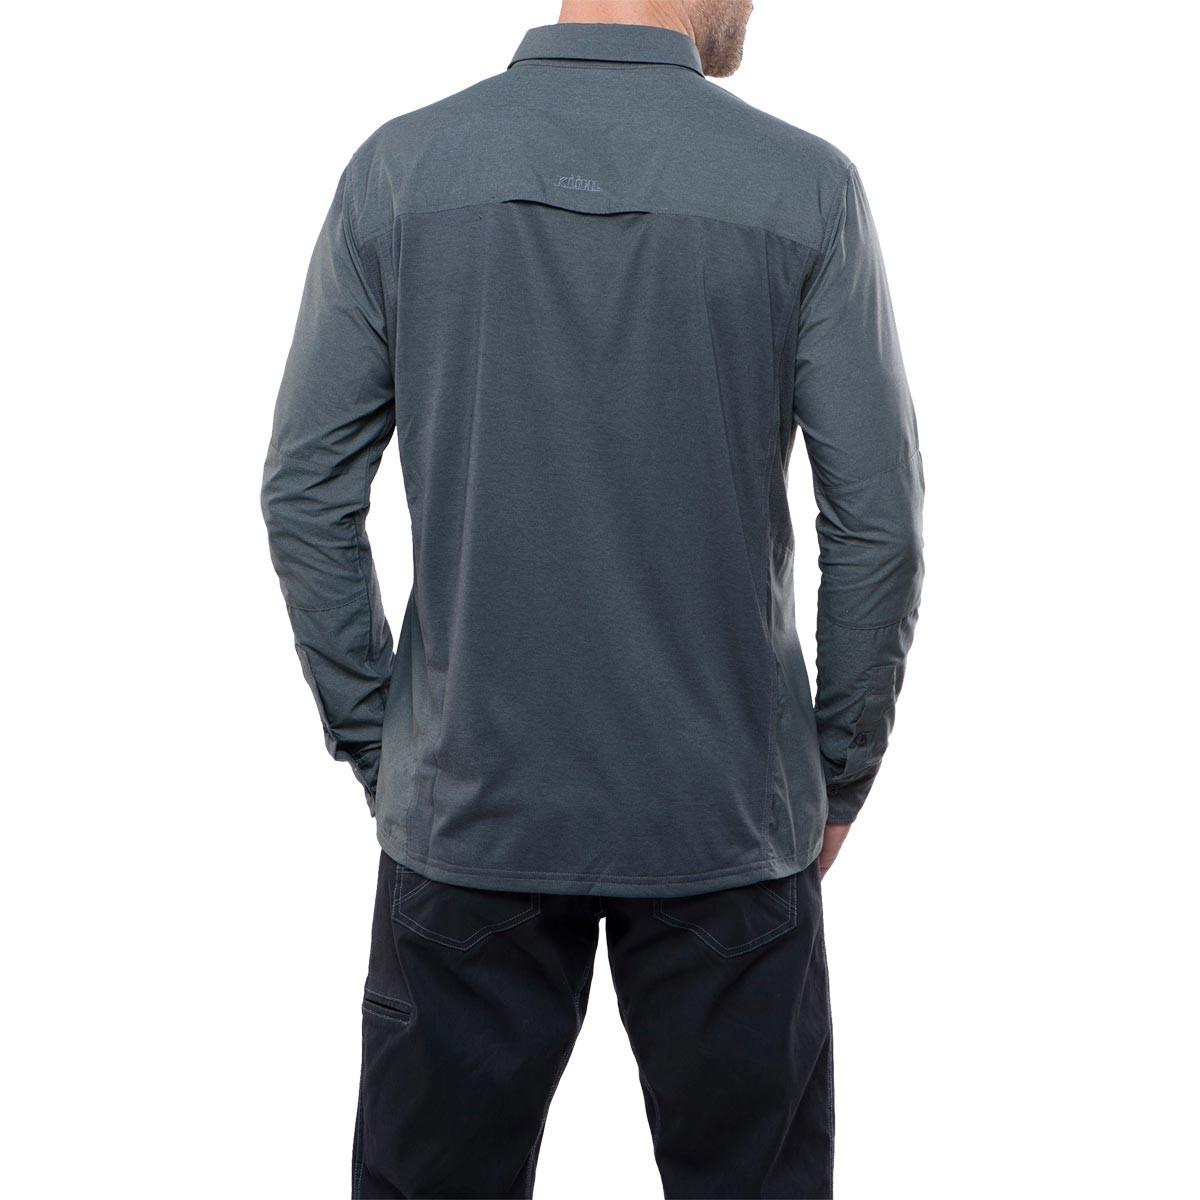 Kuhl Airspeed L S Shirt Mens Adventure Gear Albury